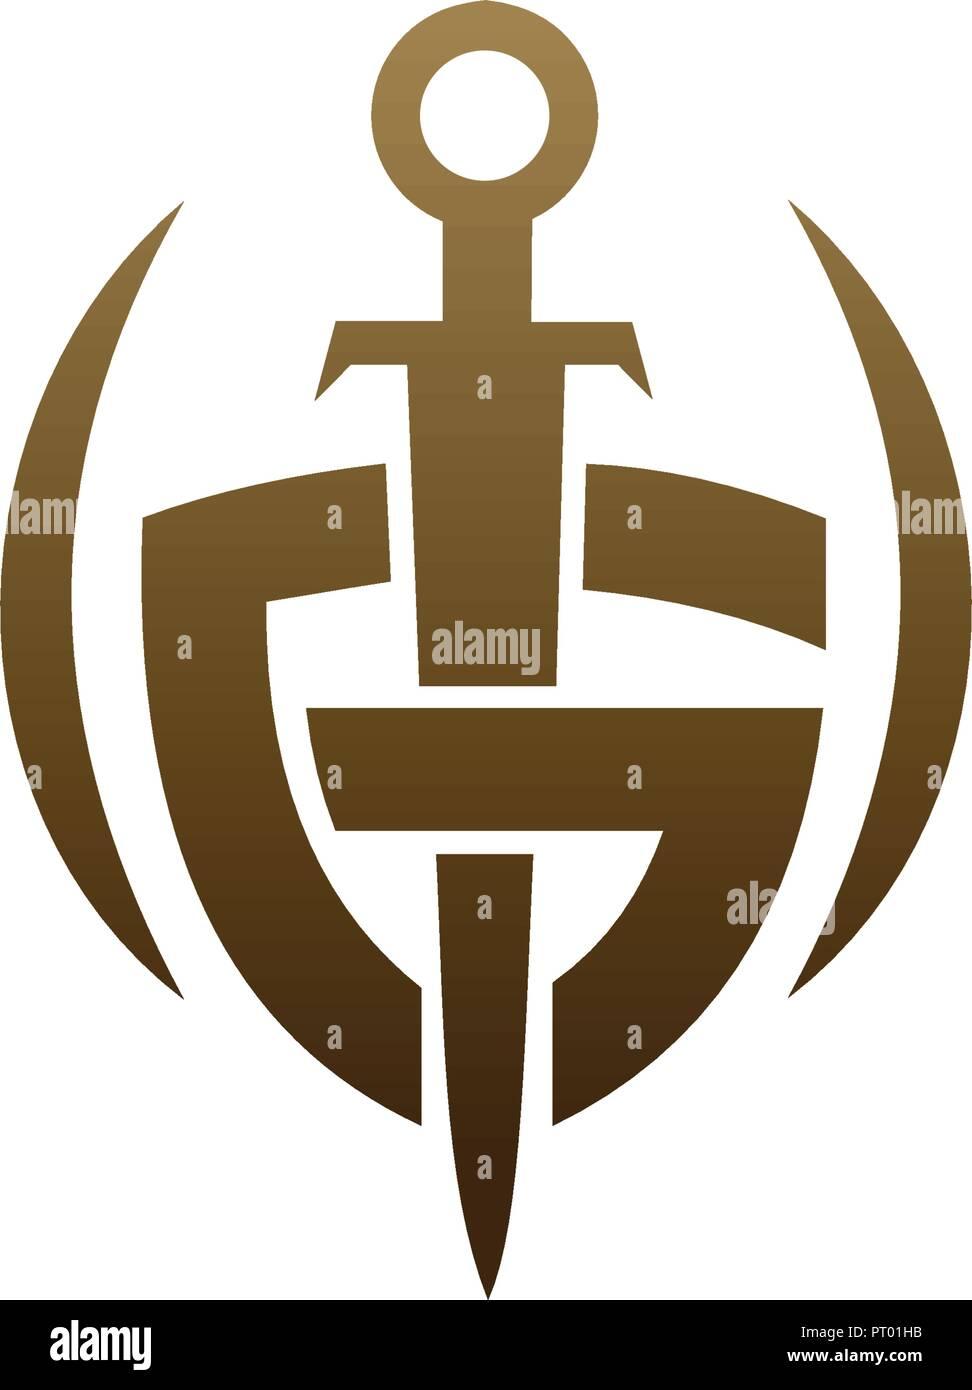 letter g shield sword logo security logo design concept template